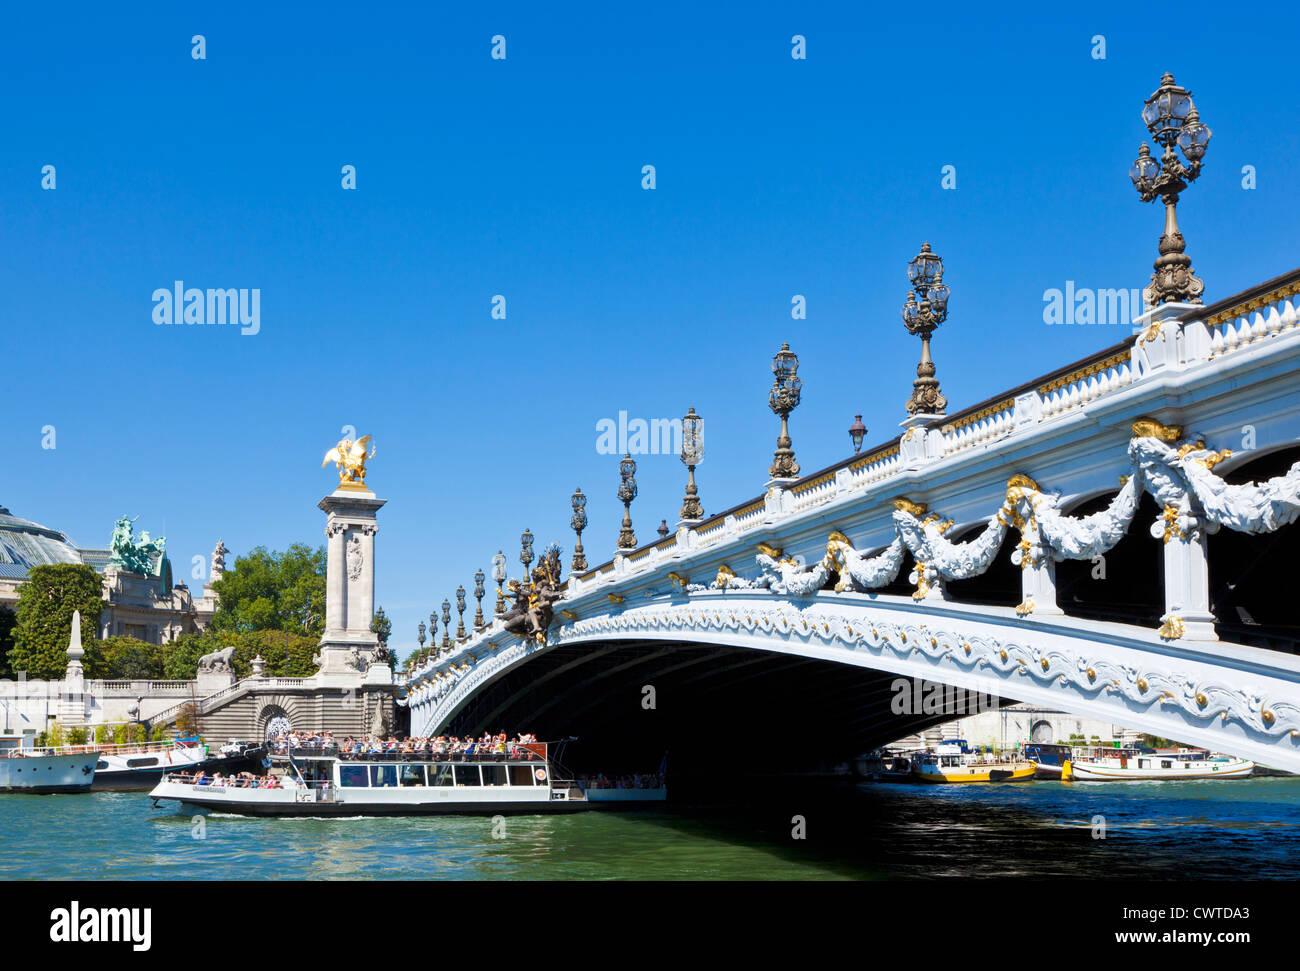 River Seine Cruise boat bateaux mouches under the Pont Alexandre III (bridge) Paris, France, Europe - Stock Image